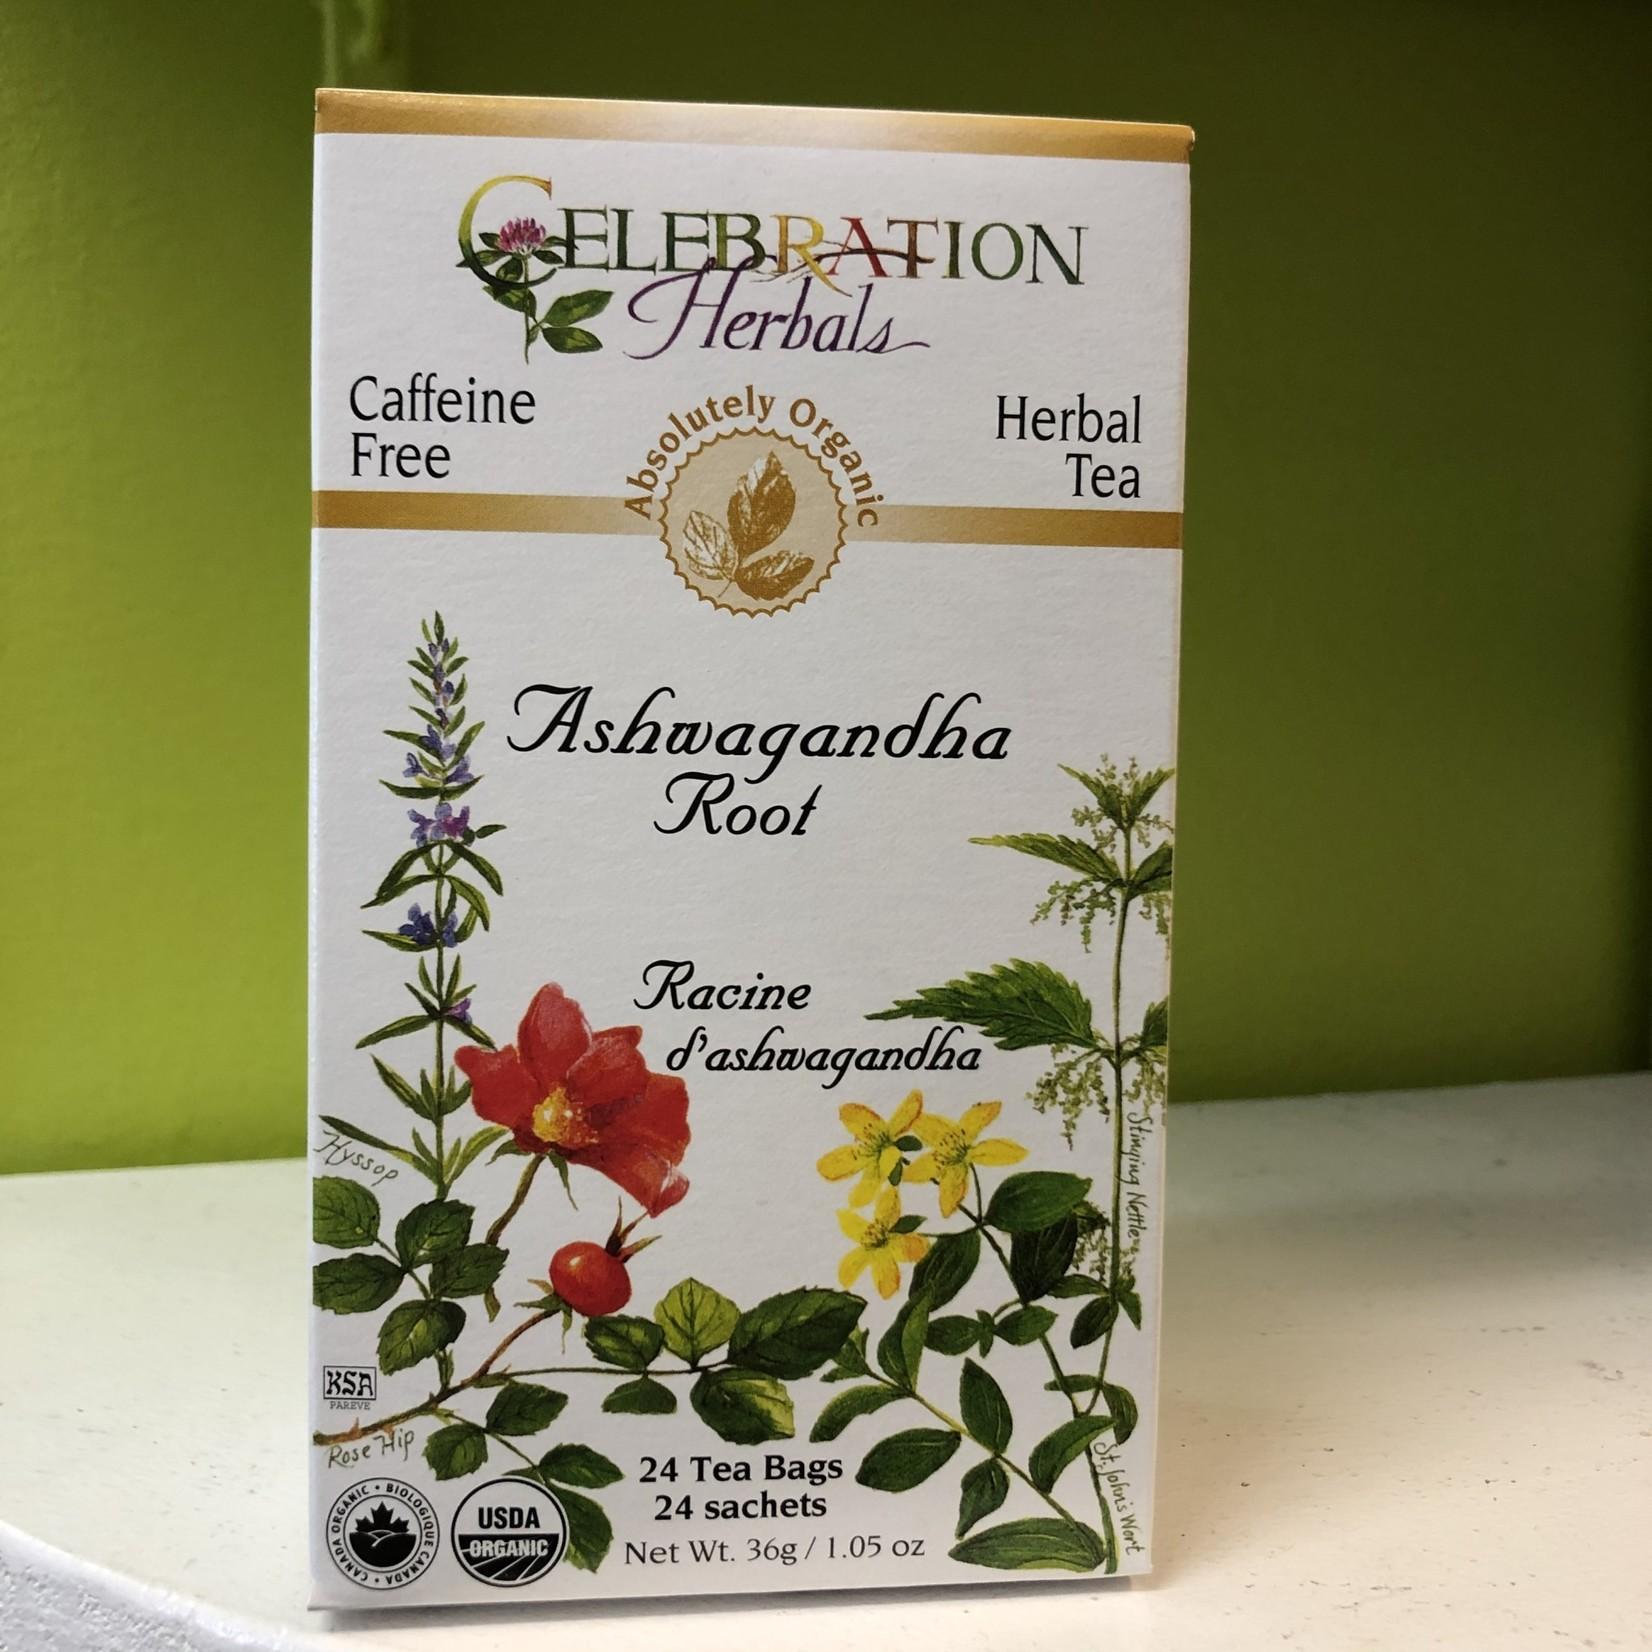 Celebration Herbals Celebration Herbals Ashwagandha Root Tea 24 Tea Bags